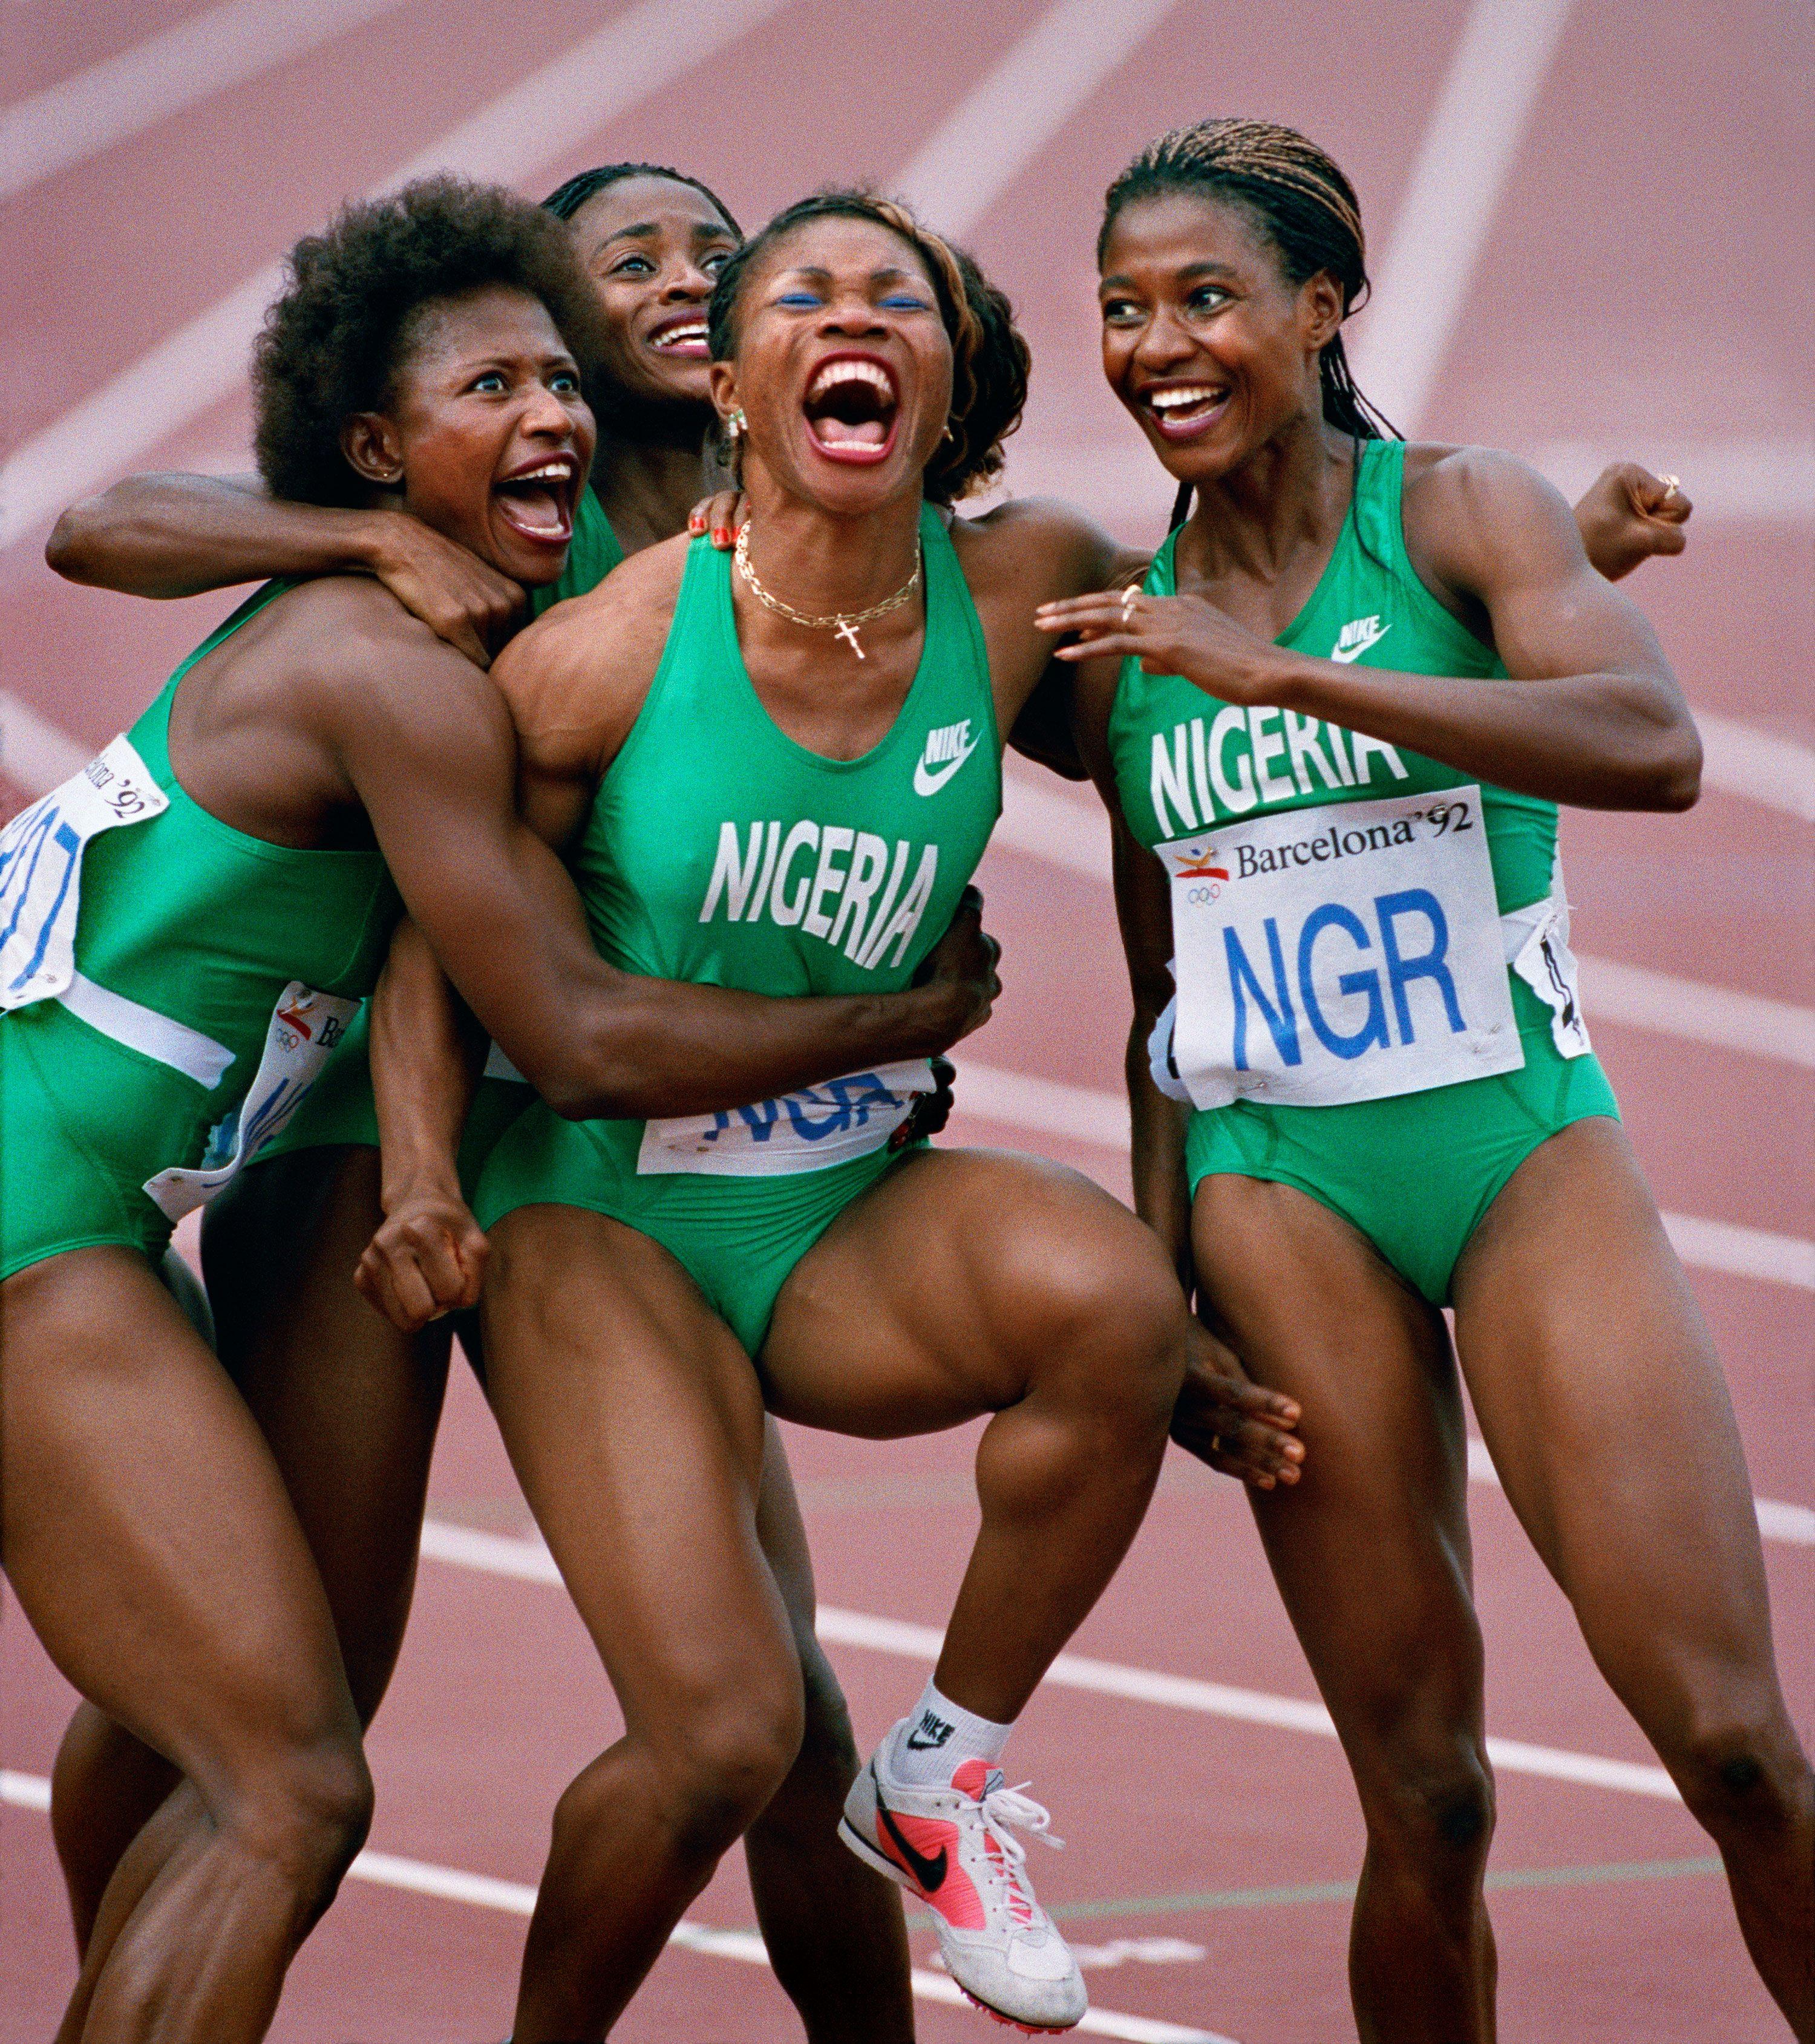 Ken Geiger (American, born 1957). Nigerian Relay Team, Olympics, Barcelona, 1992, printed 2016. Inkjet print, 177/16 x 195/8 in. (44.3 x 49.9 cm). Courtesy of Ken Geiger/The Dallas Morning News